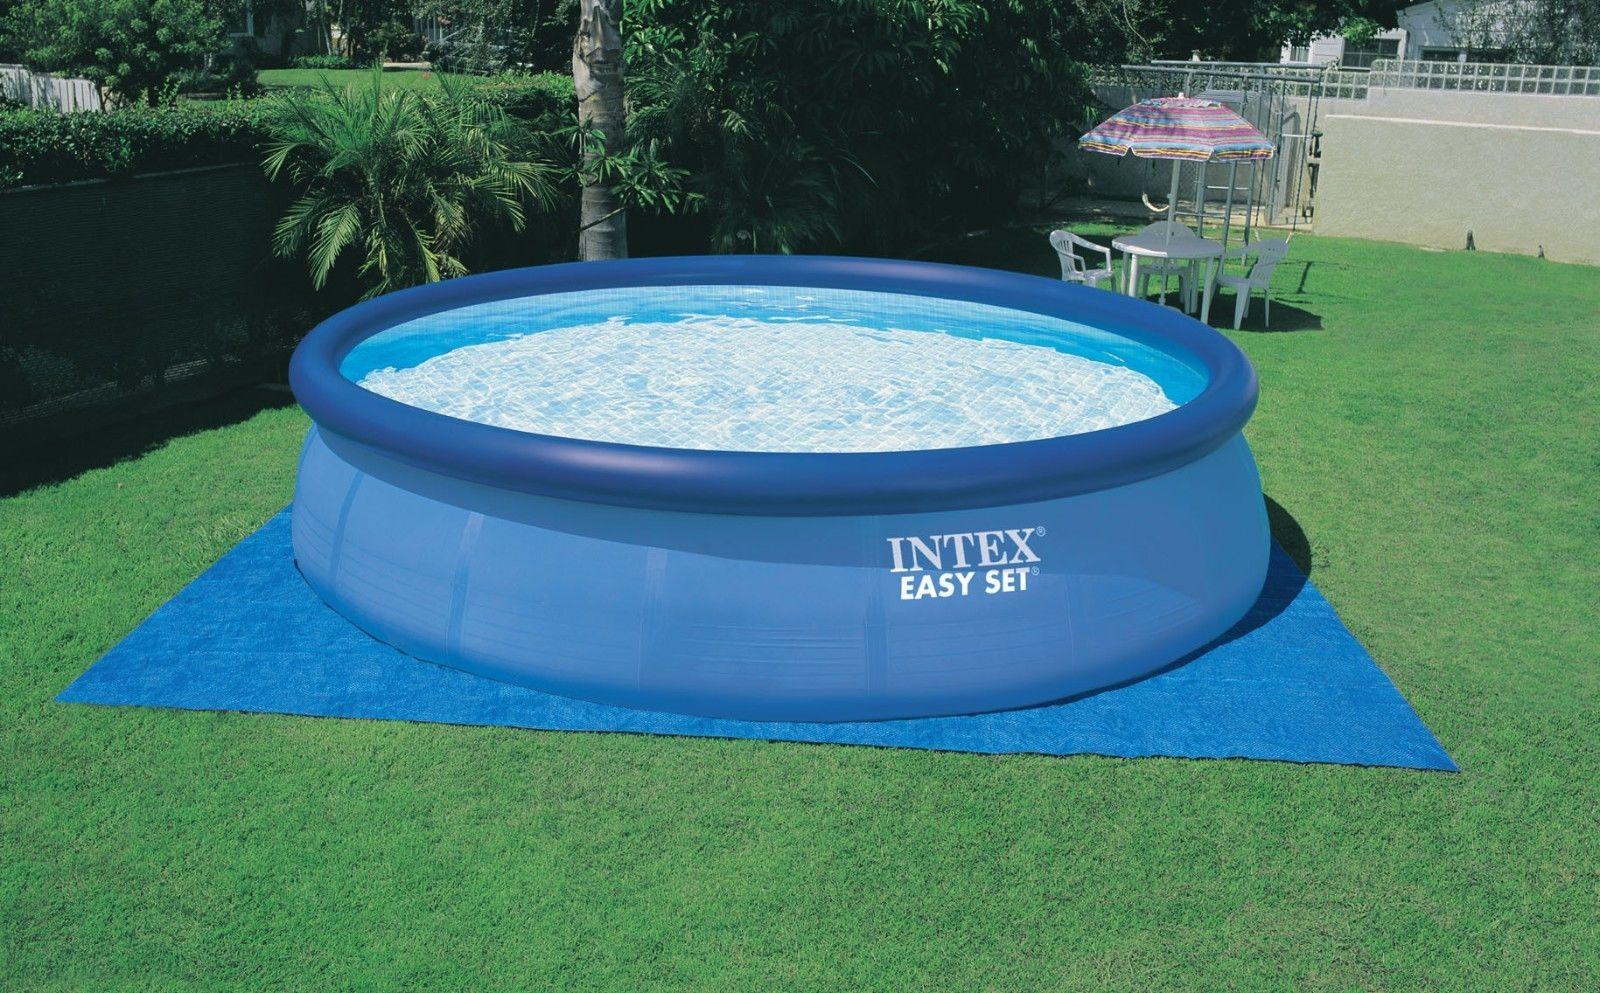 Intex 15 X 48 Easy Set Above Ground Swimming Pool W 1000 Gph Gfci Pump 26167eh Martlocal